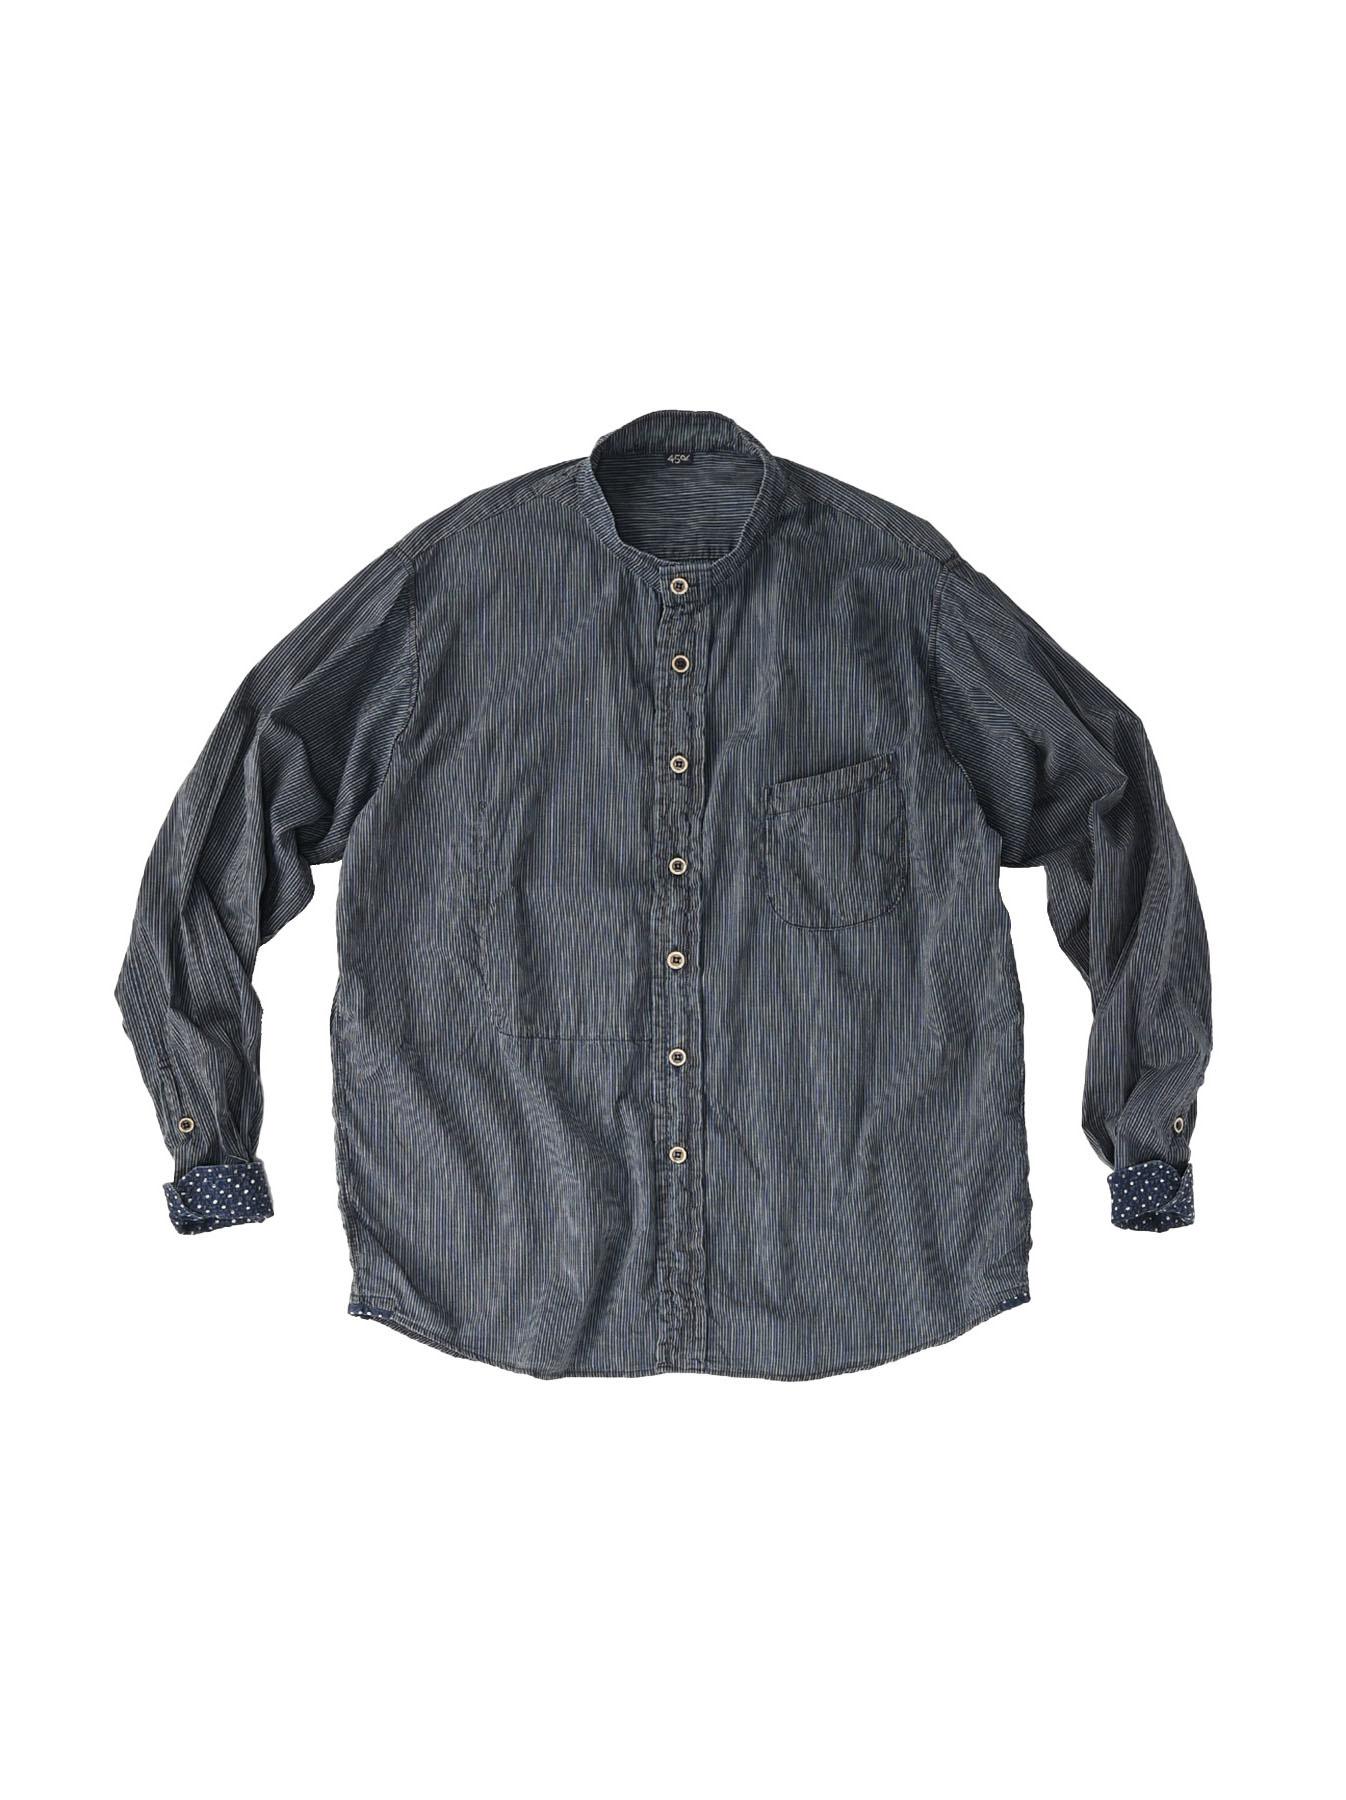 Indigo Hickory Tappet Ocean Stand Shirt-1